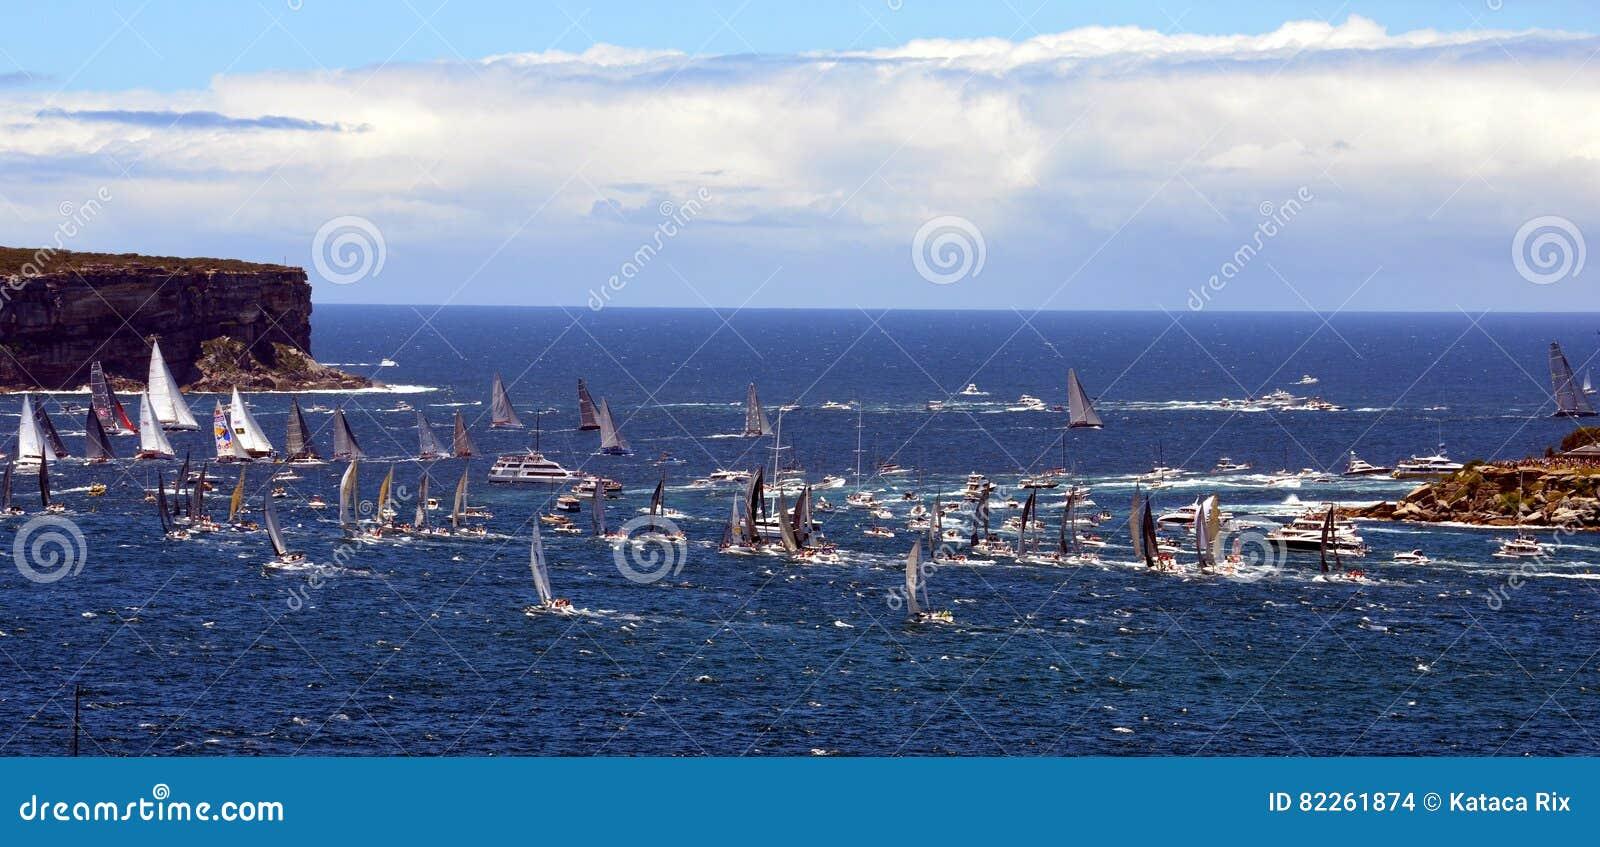 Sydney Hobart Yacht Race 2013